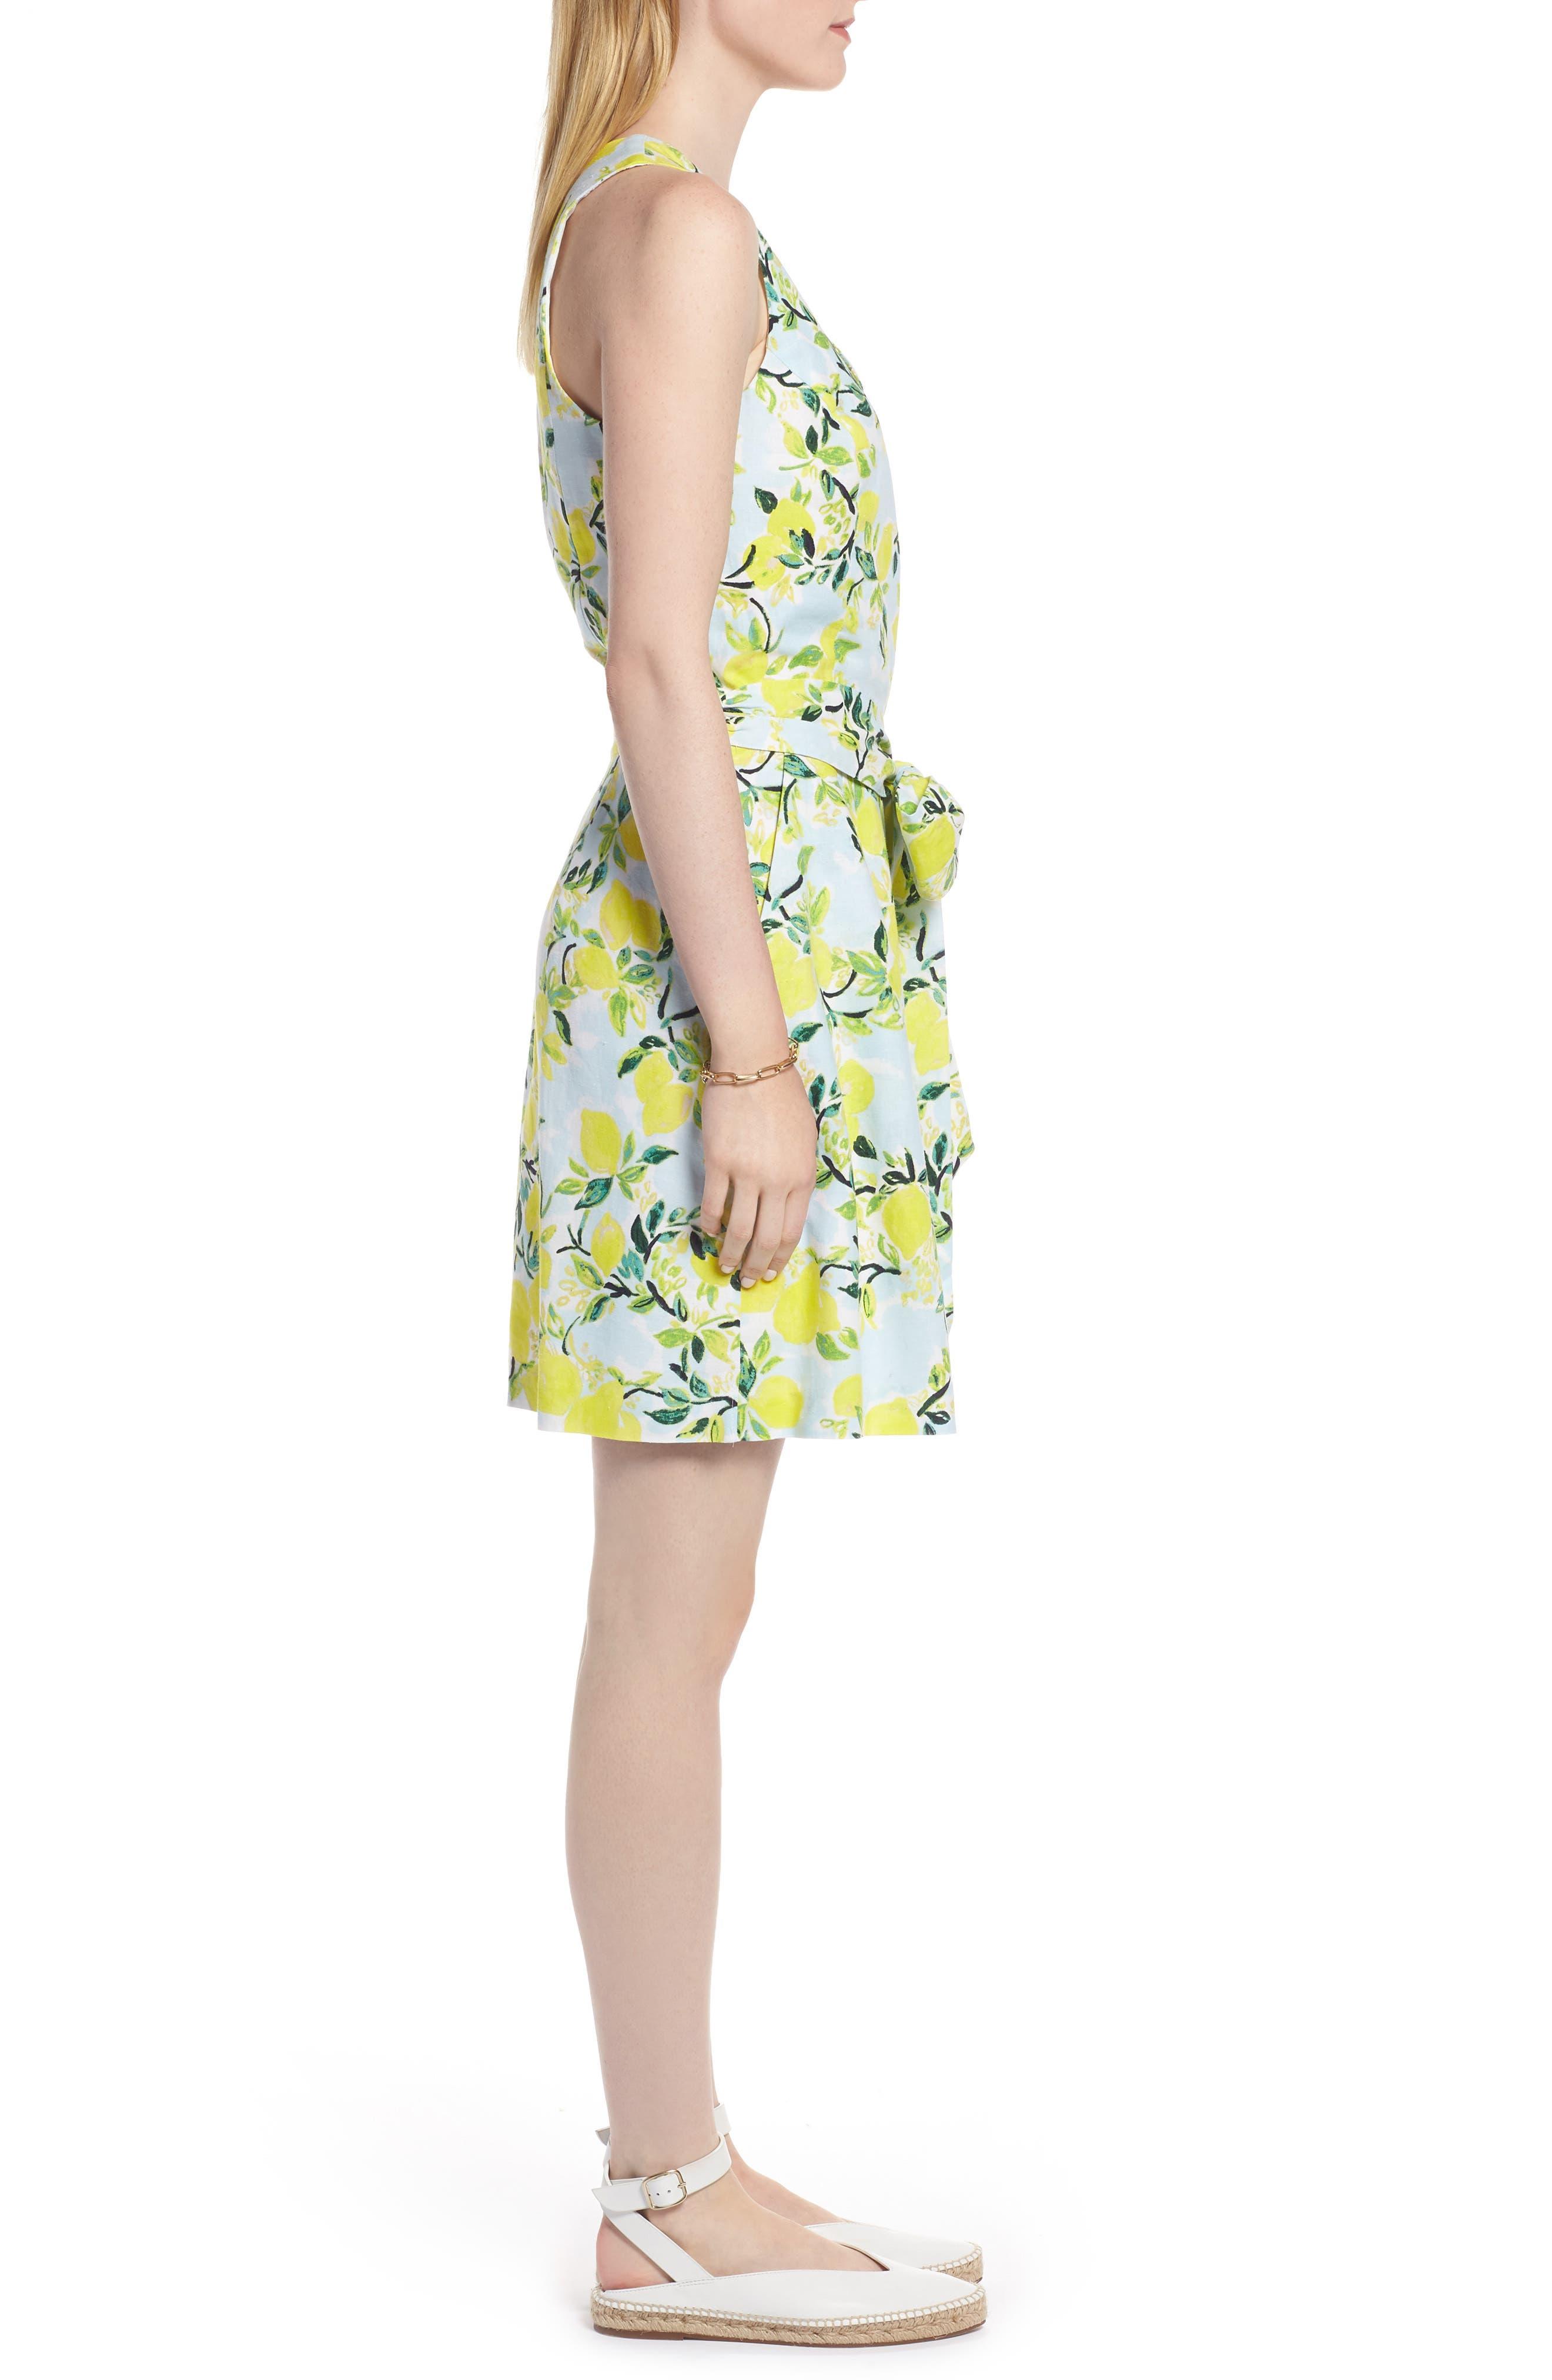 Tie Front Lemon Print Mini Dress,                             Alternate thumbnail 3, color,                             Blue- Yellow Citrus Print